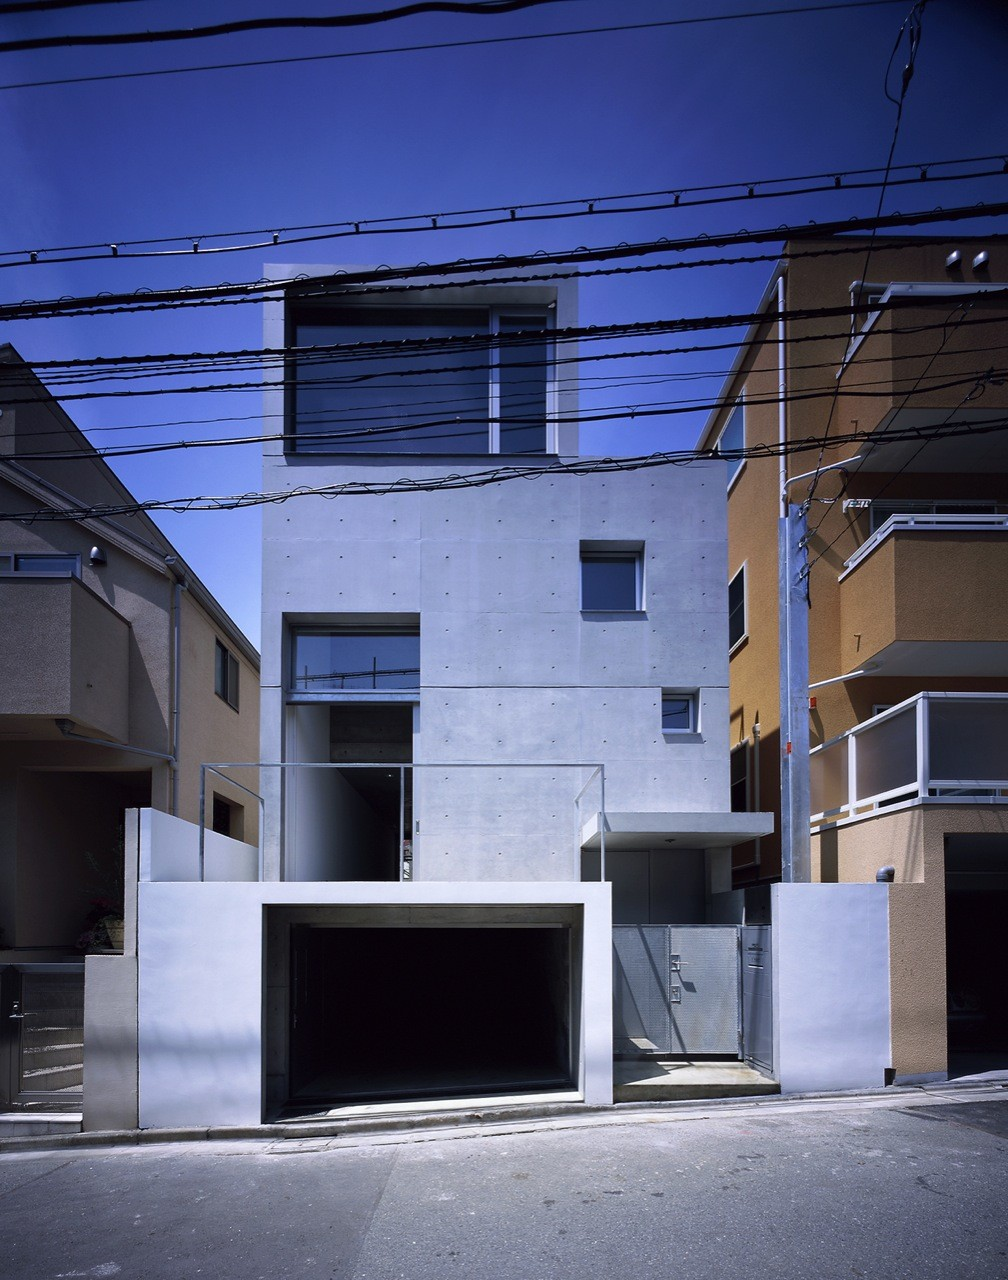 Noh House / Koji Tsutsui Architect & Associates, © Masao Nishikawa